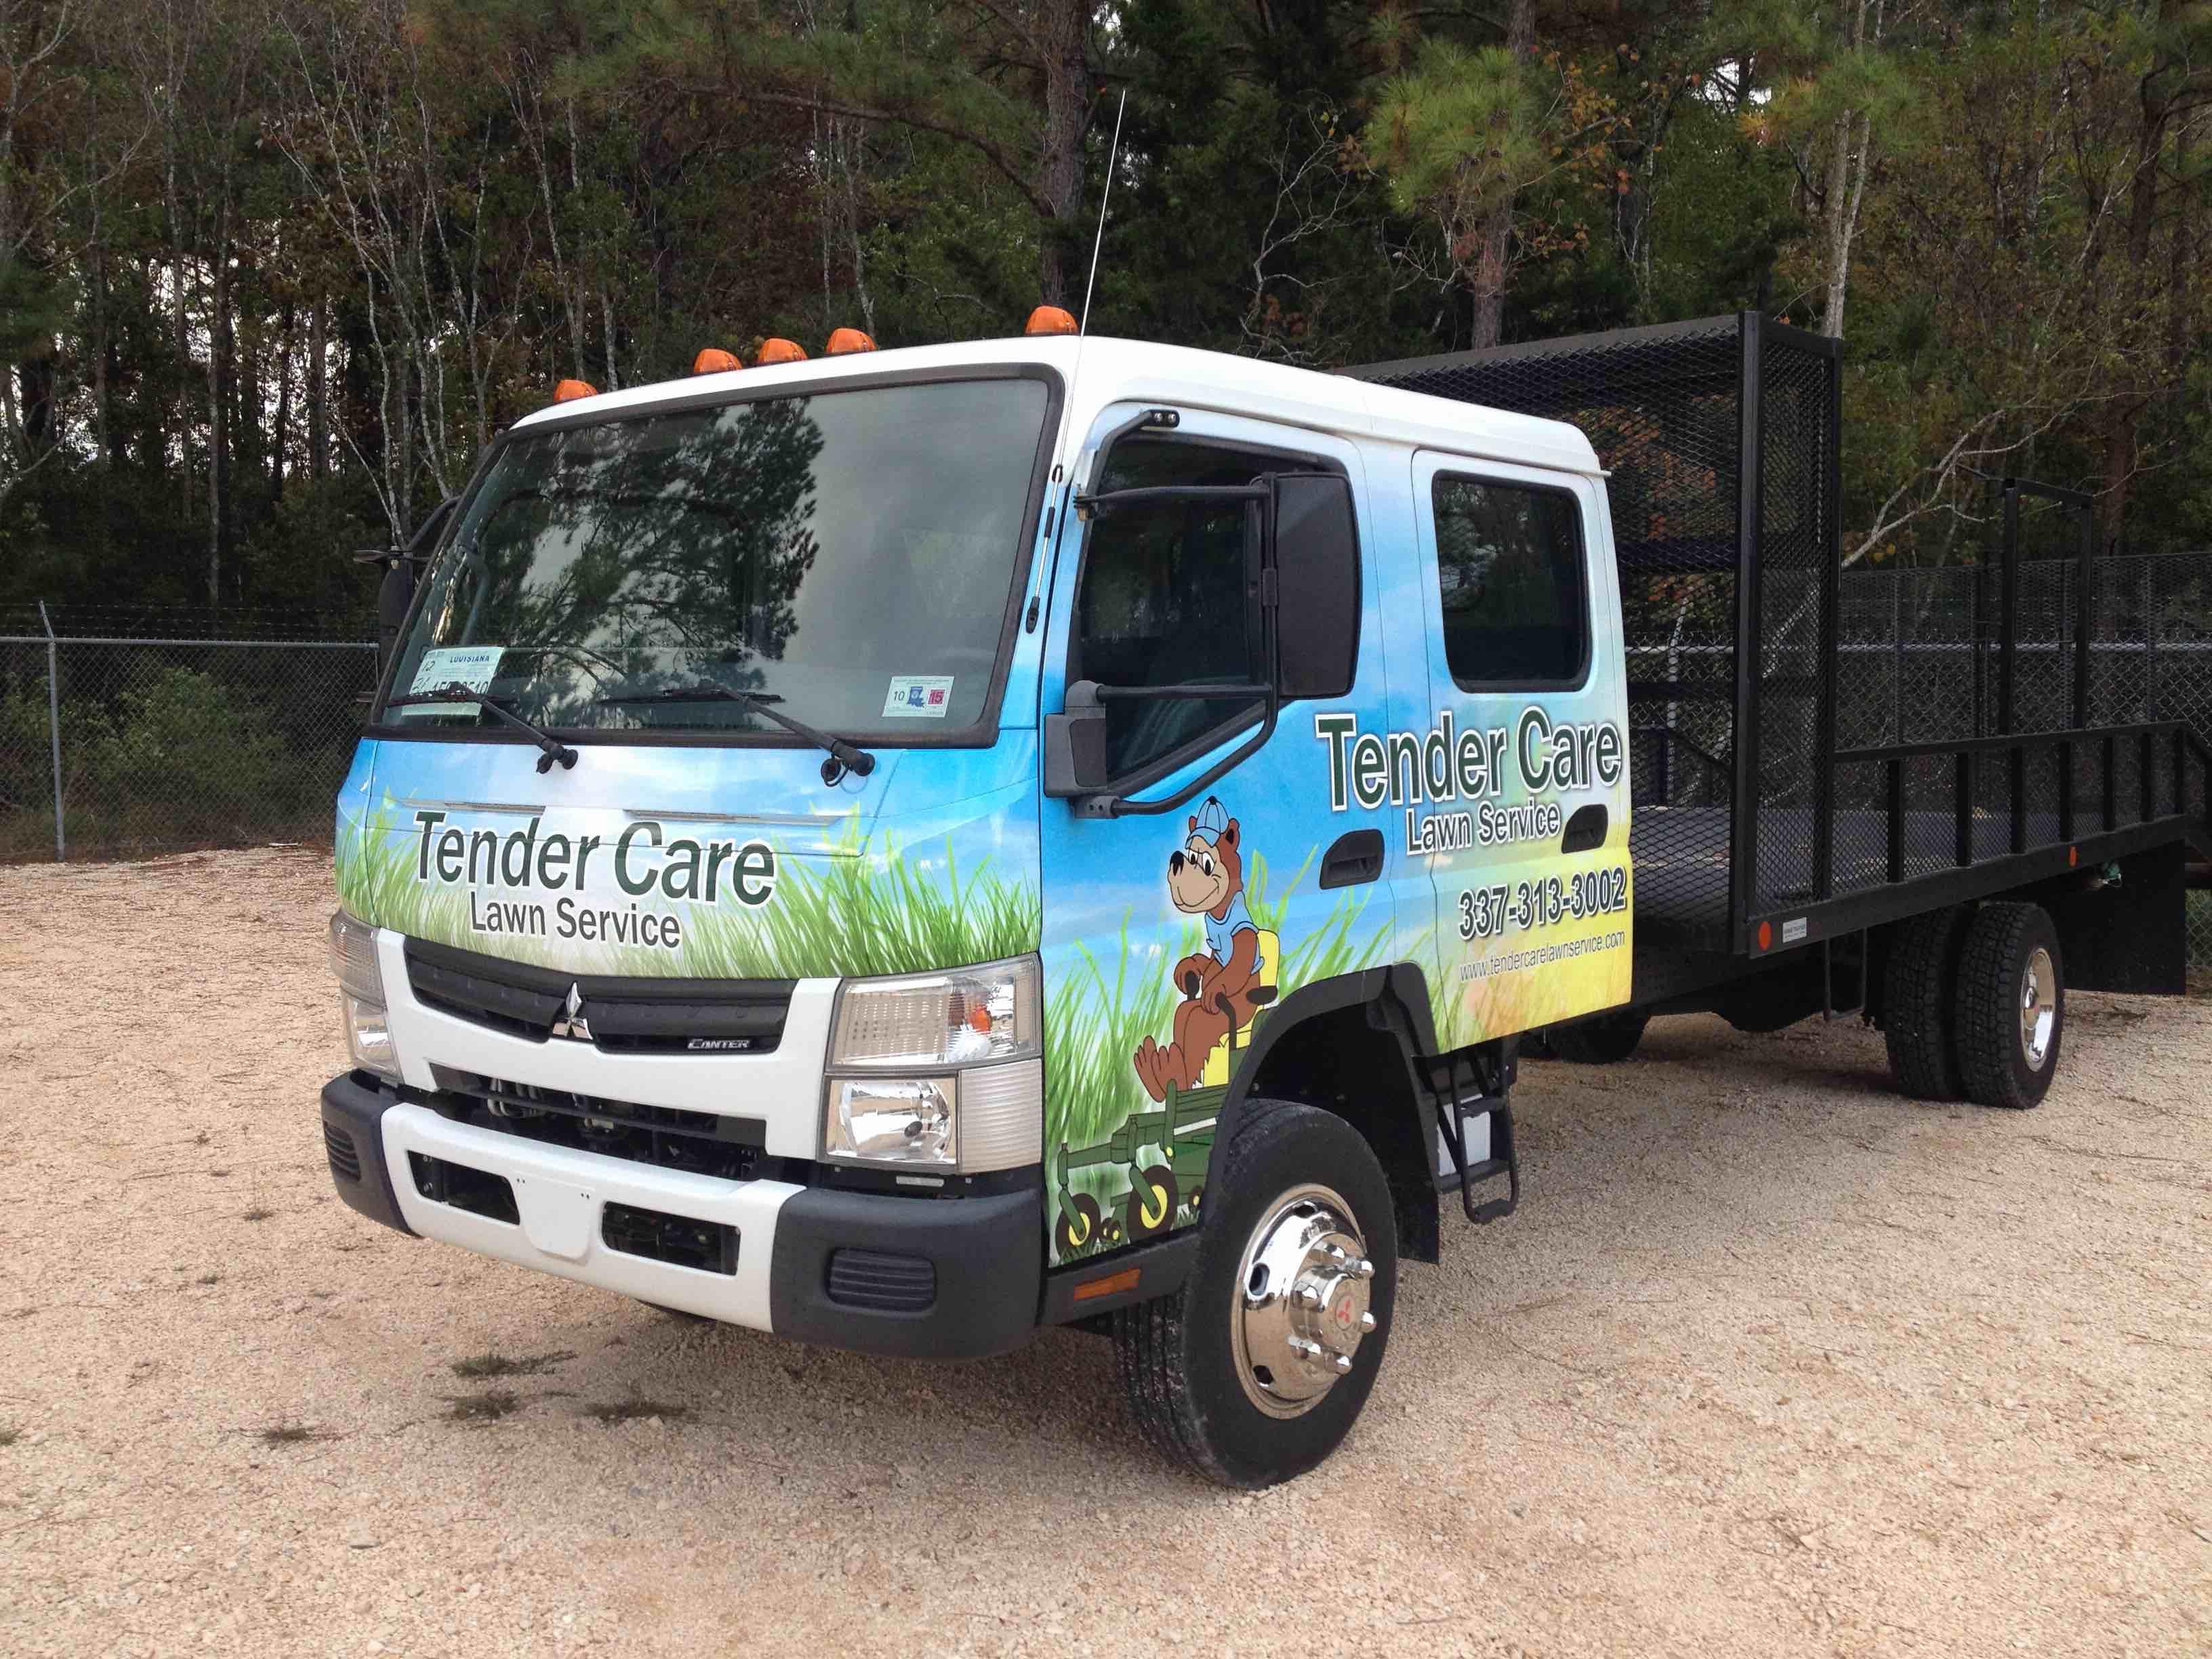 Tender care lawn service sulphur la 70665 angies list for Lawn maintenance companies